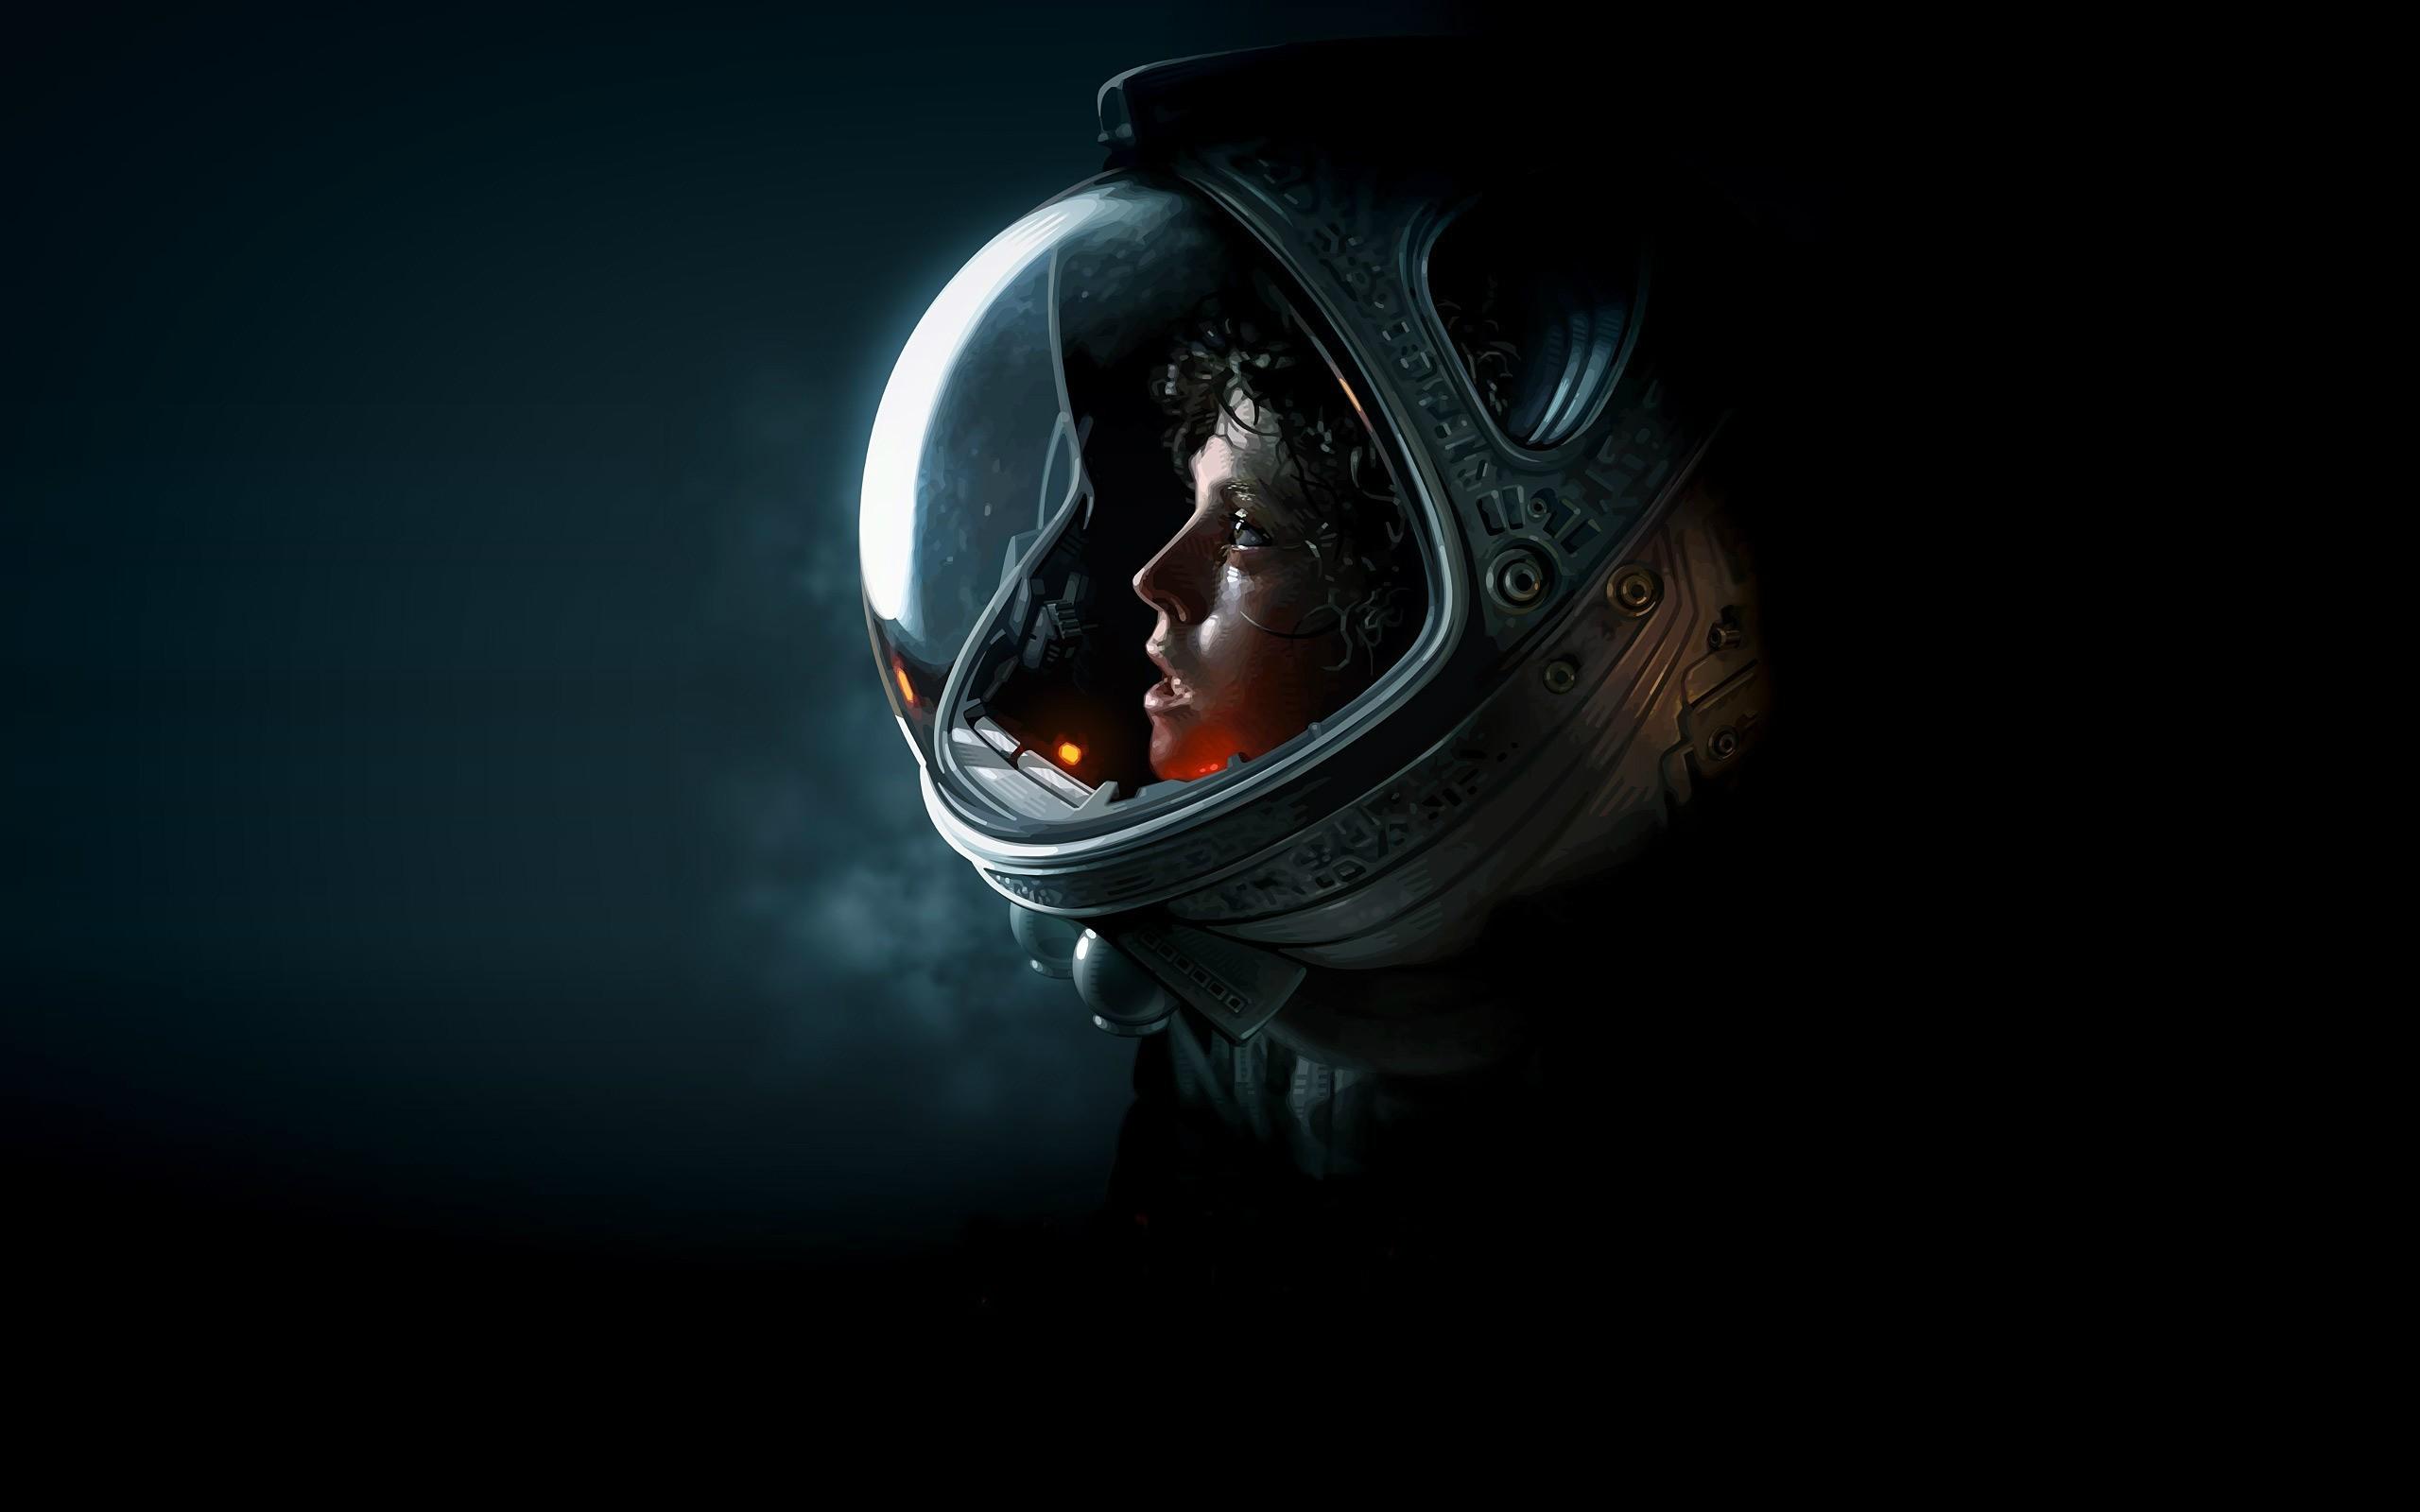 Alien movie Sigourney Weaver Ellen Ripley Artwork 2560x1600